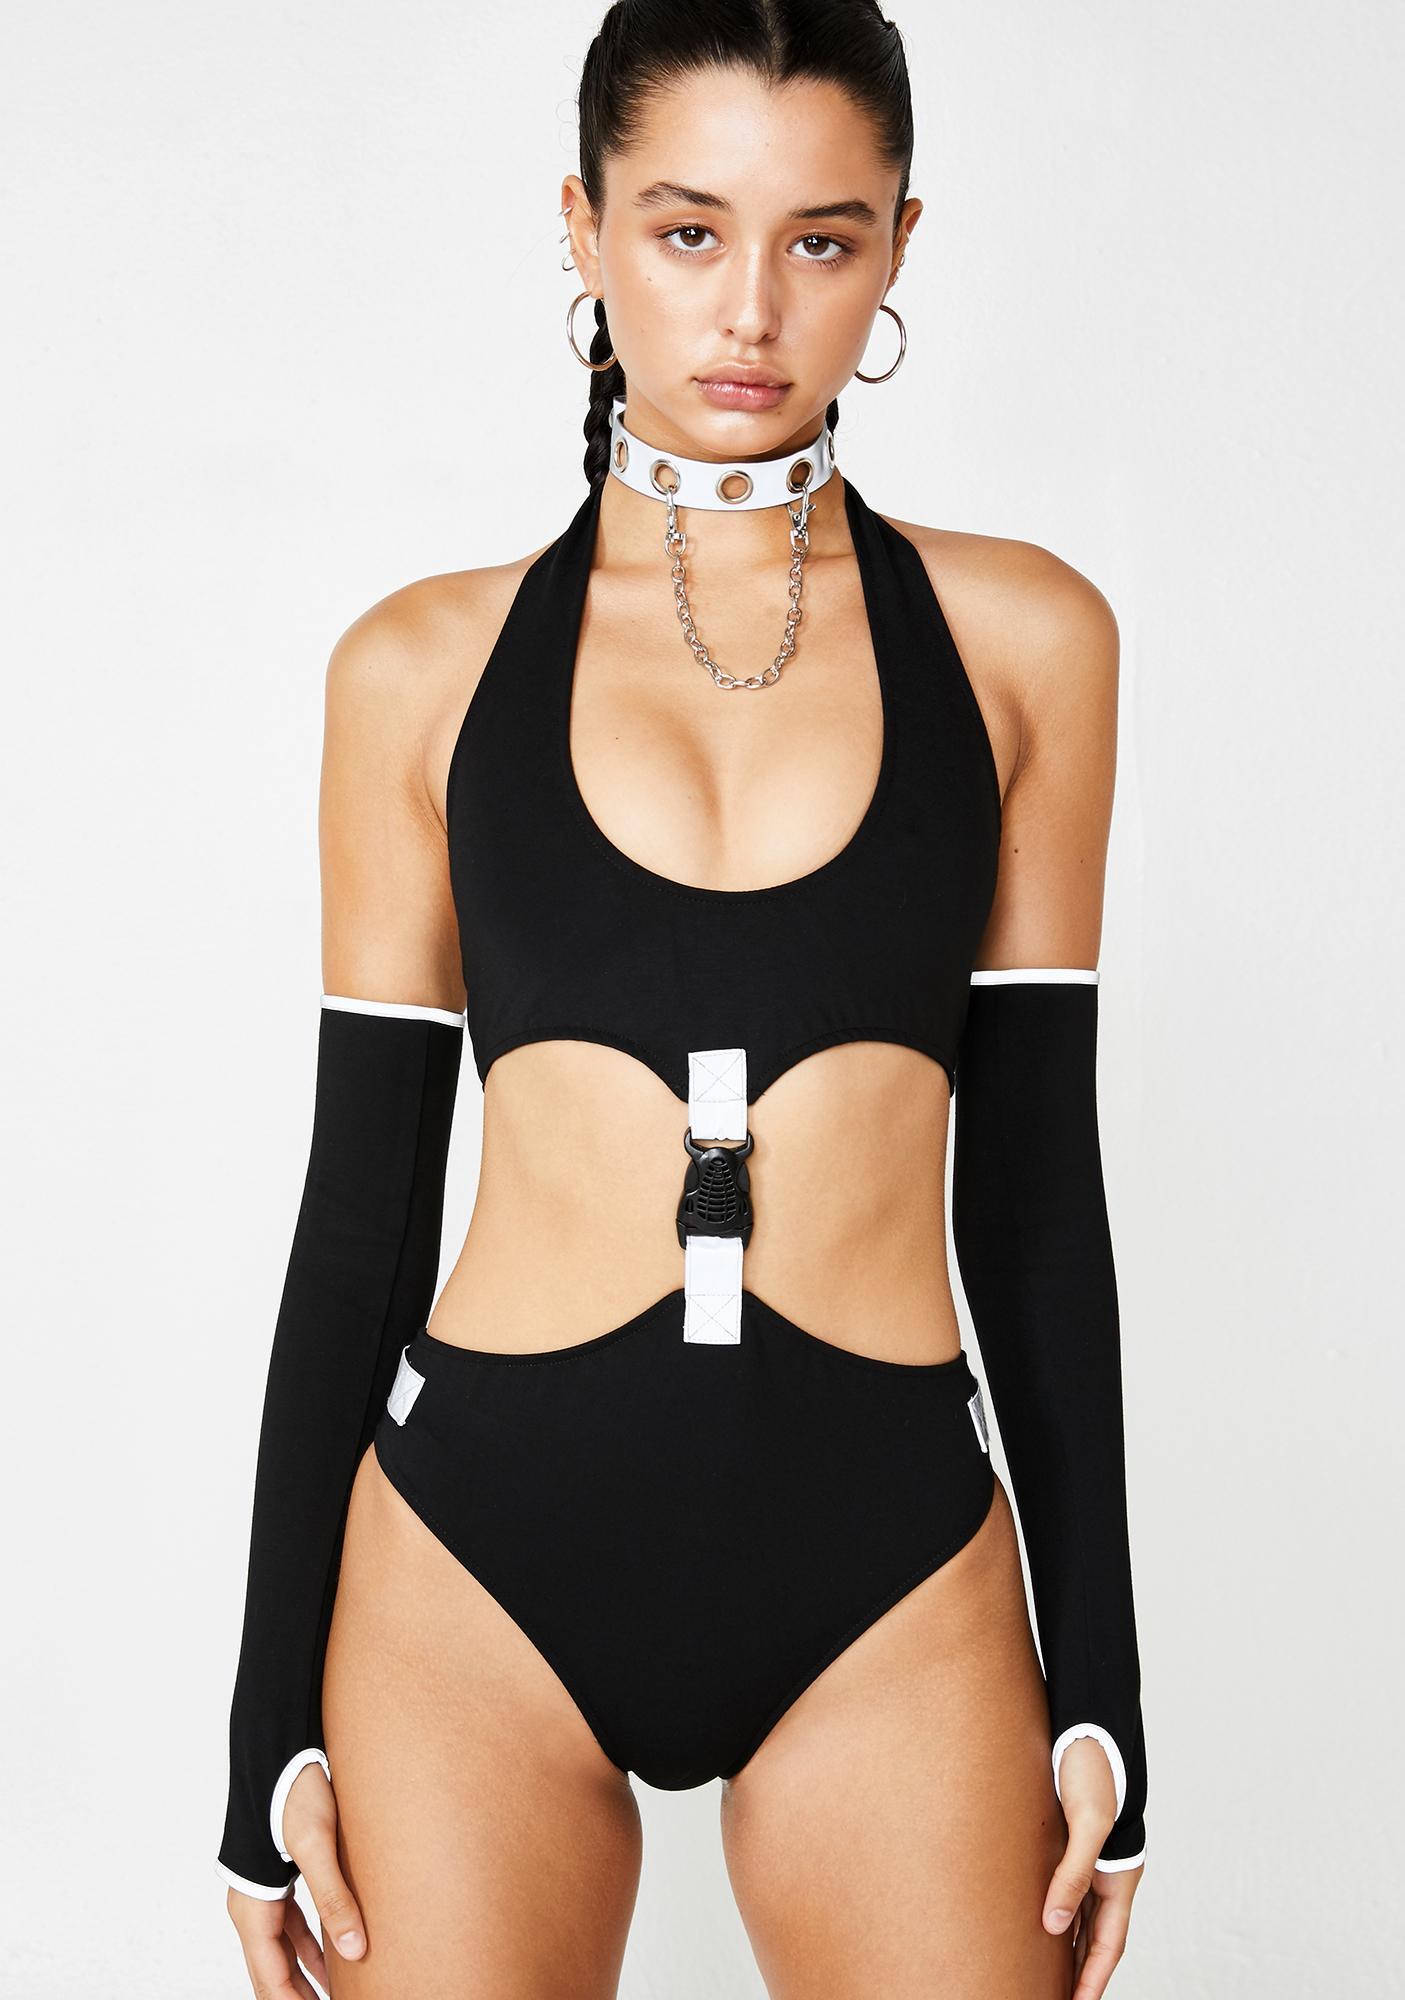 Poster Grl Can't Be Copied Bodysuit Set